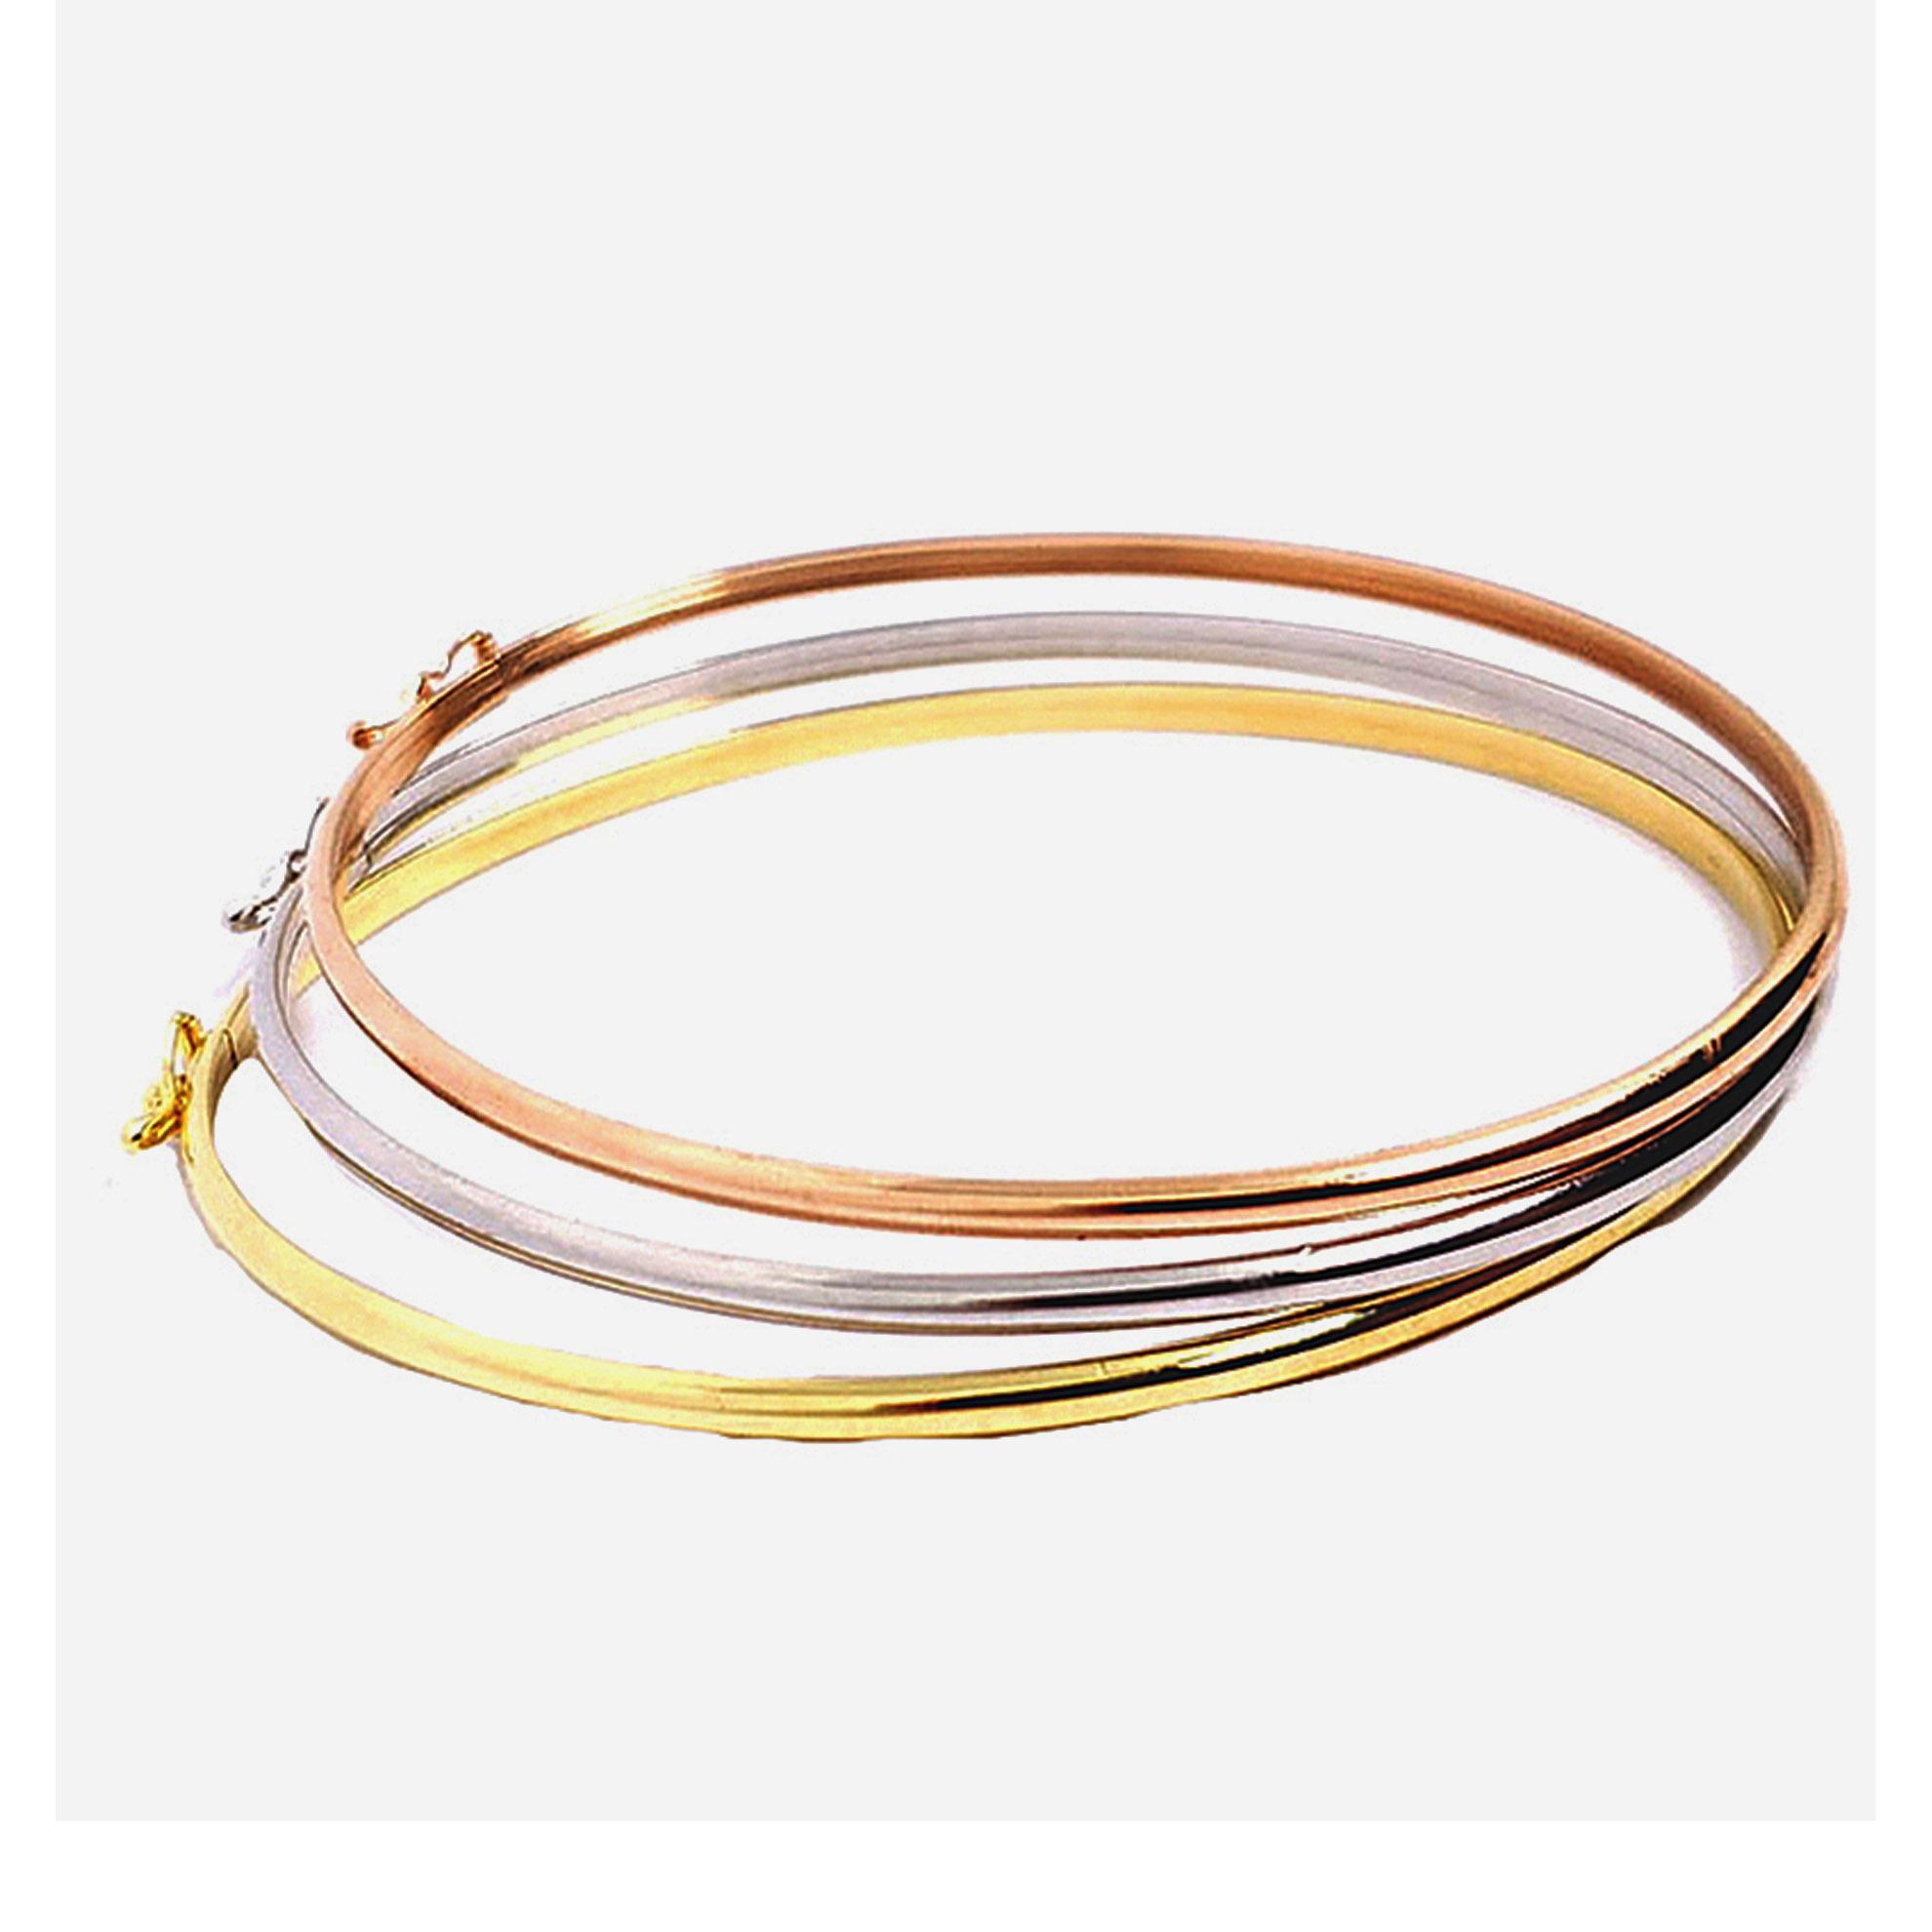 Bracelete Oval em Ouro Amarelo 18 Kilates